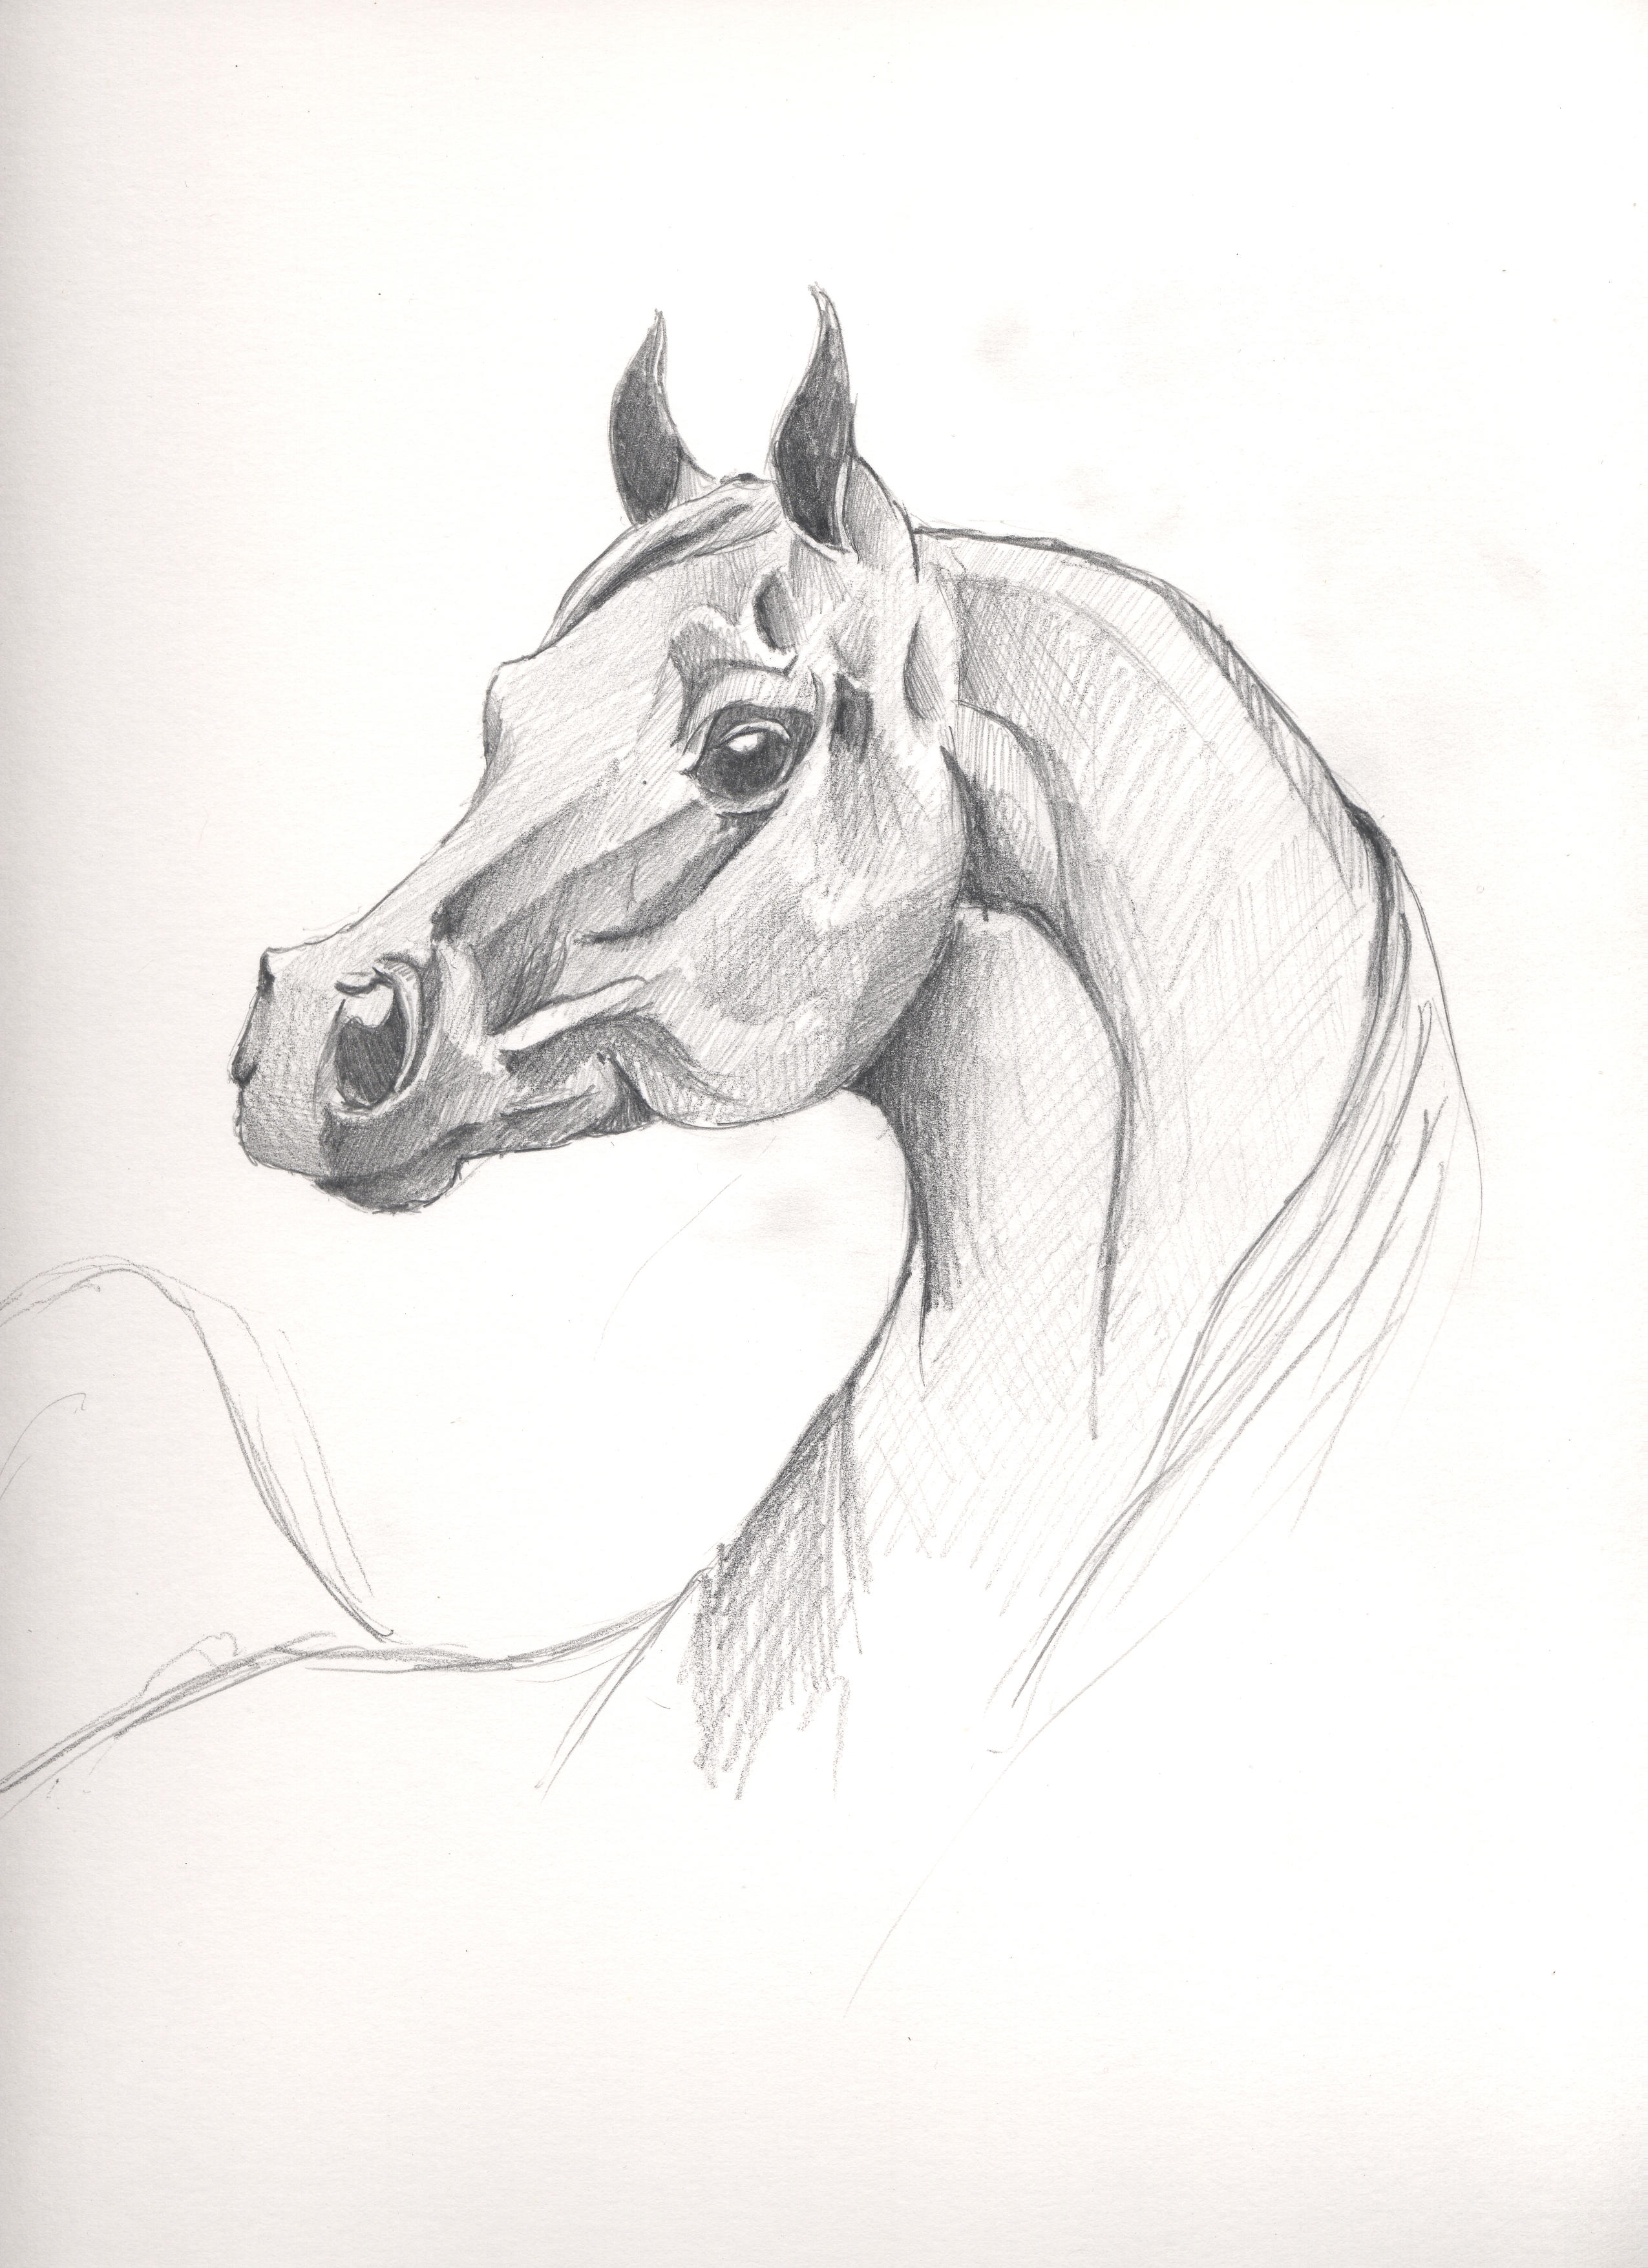 arabian horse by CoZzMiC on DeviantArt